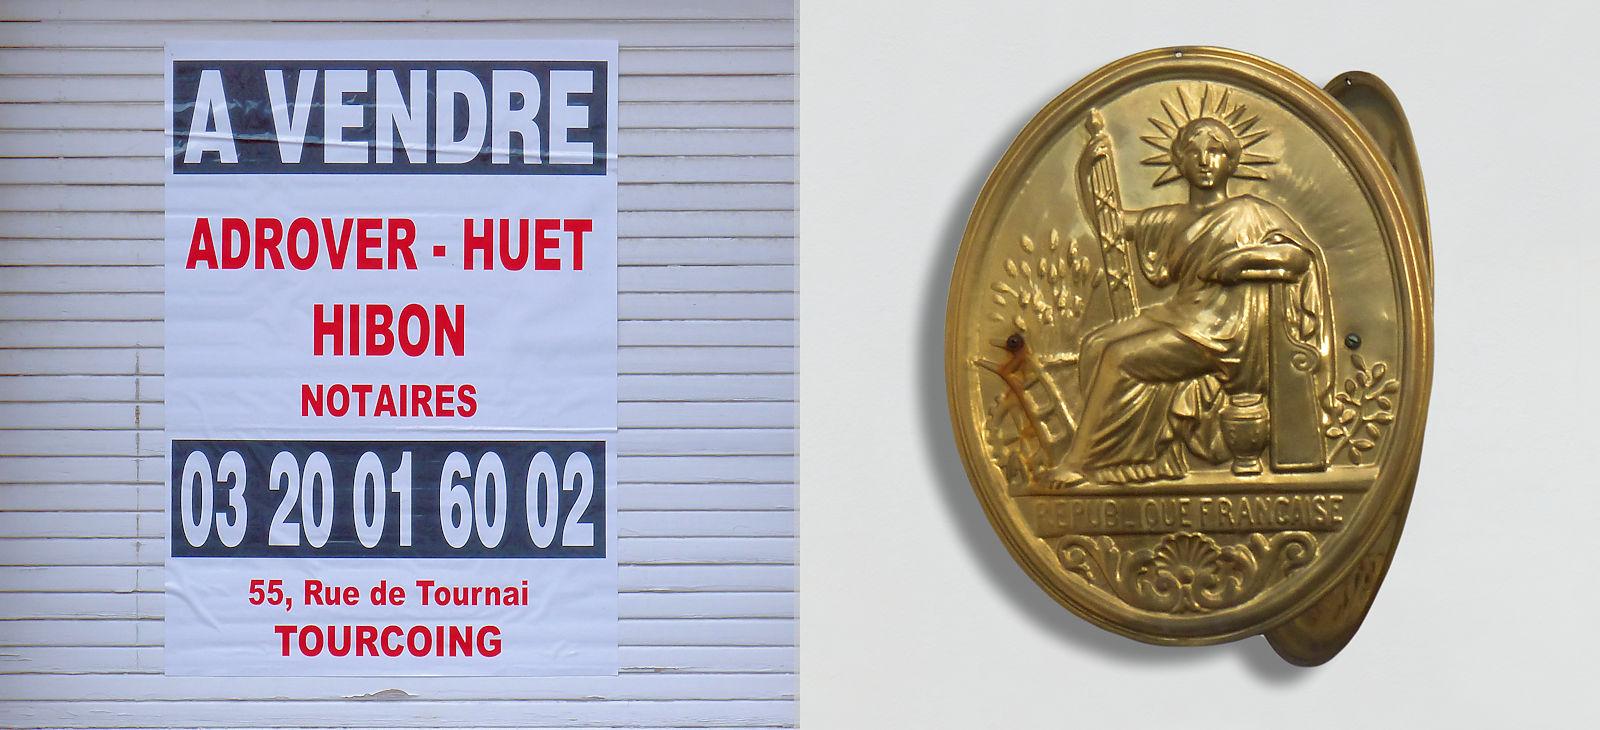 Notaire Adrover Tourcoing - Vente immobilière